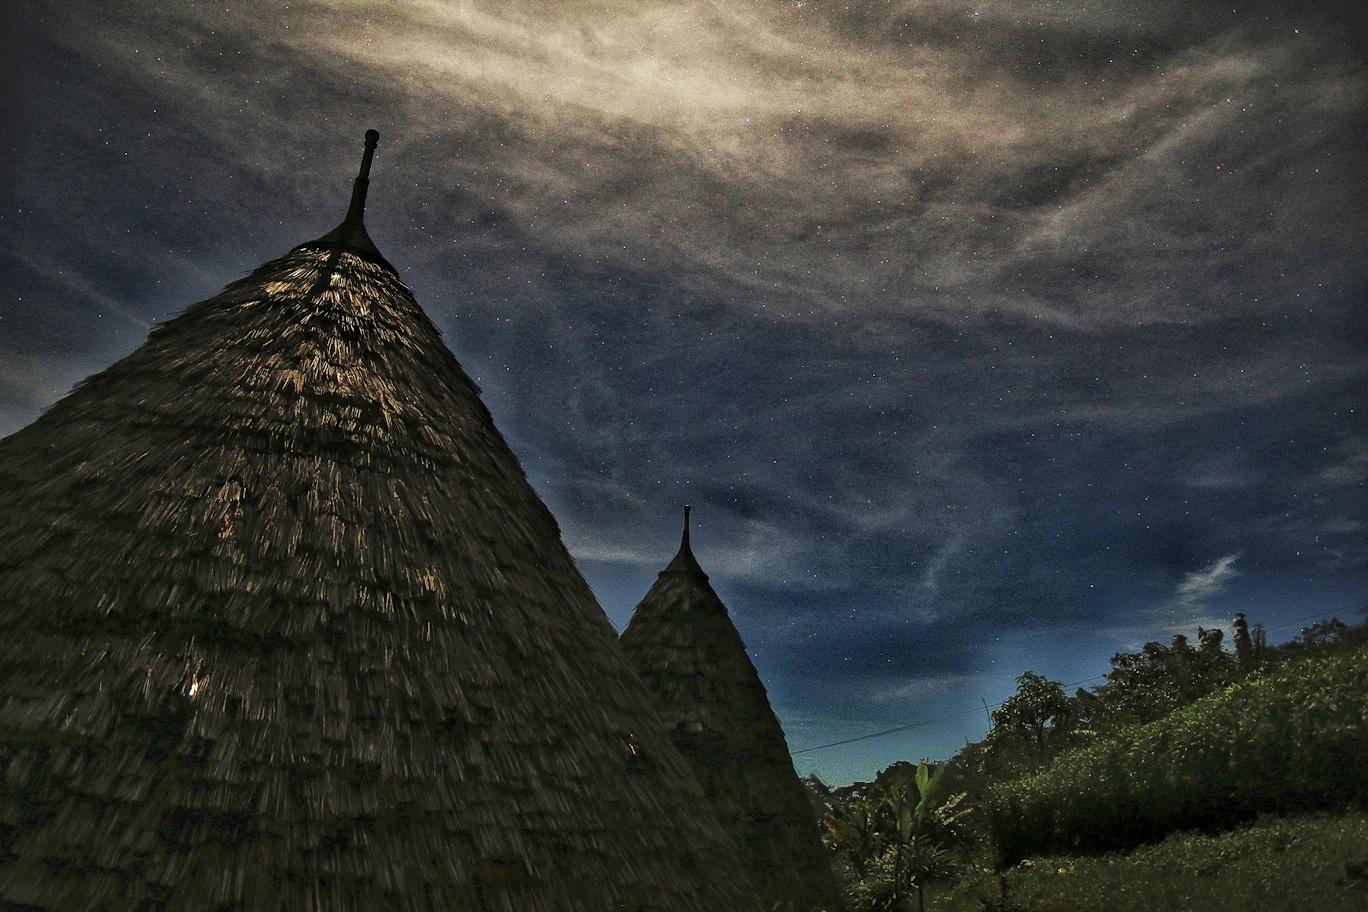 Langit malam di Waerebo terbuka luas karena minim polusi cahaya